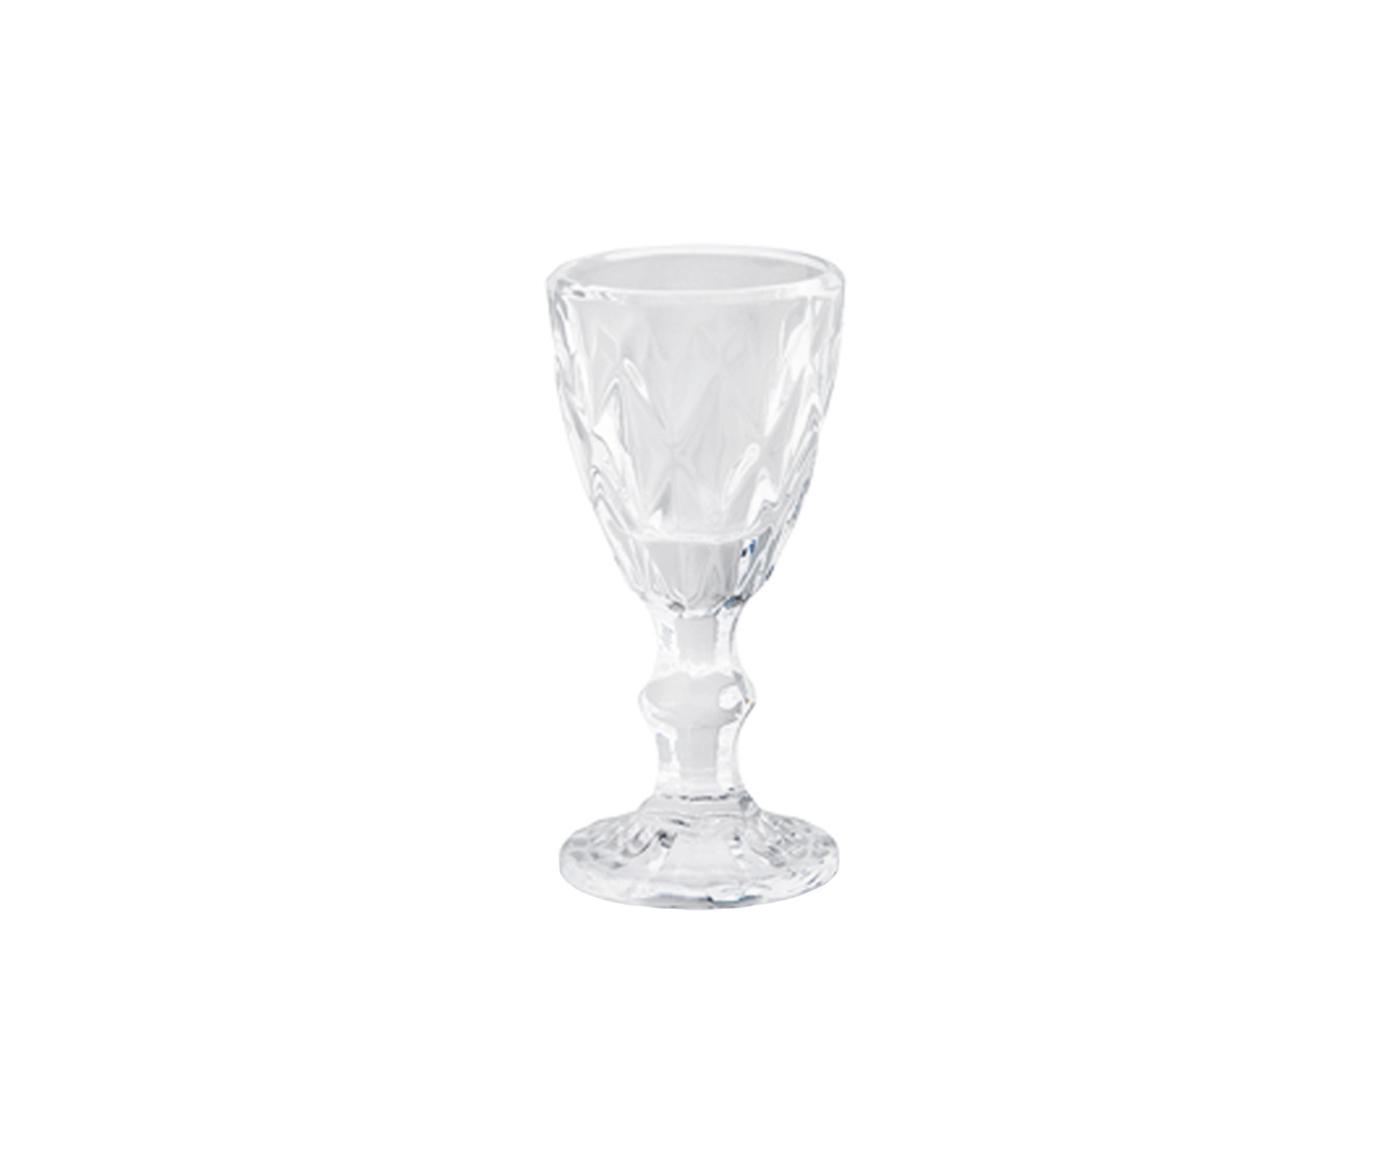 Bicchierino Prisma 6 pz, Vetro, Trasparente, Ø 5 x Alt. 11 cm